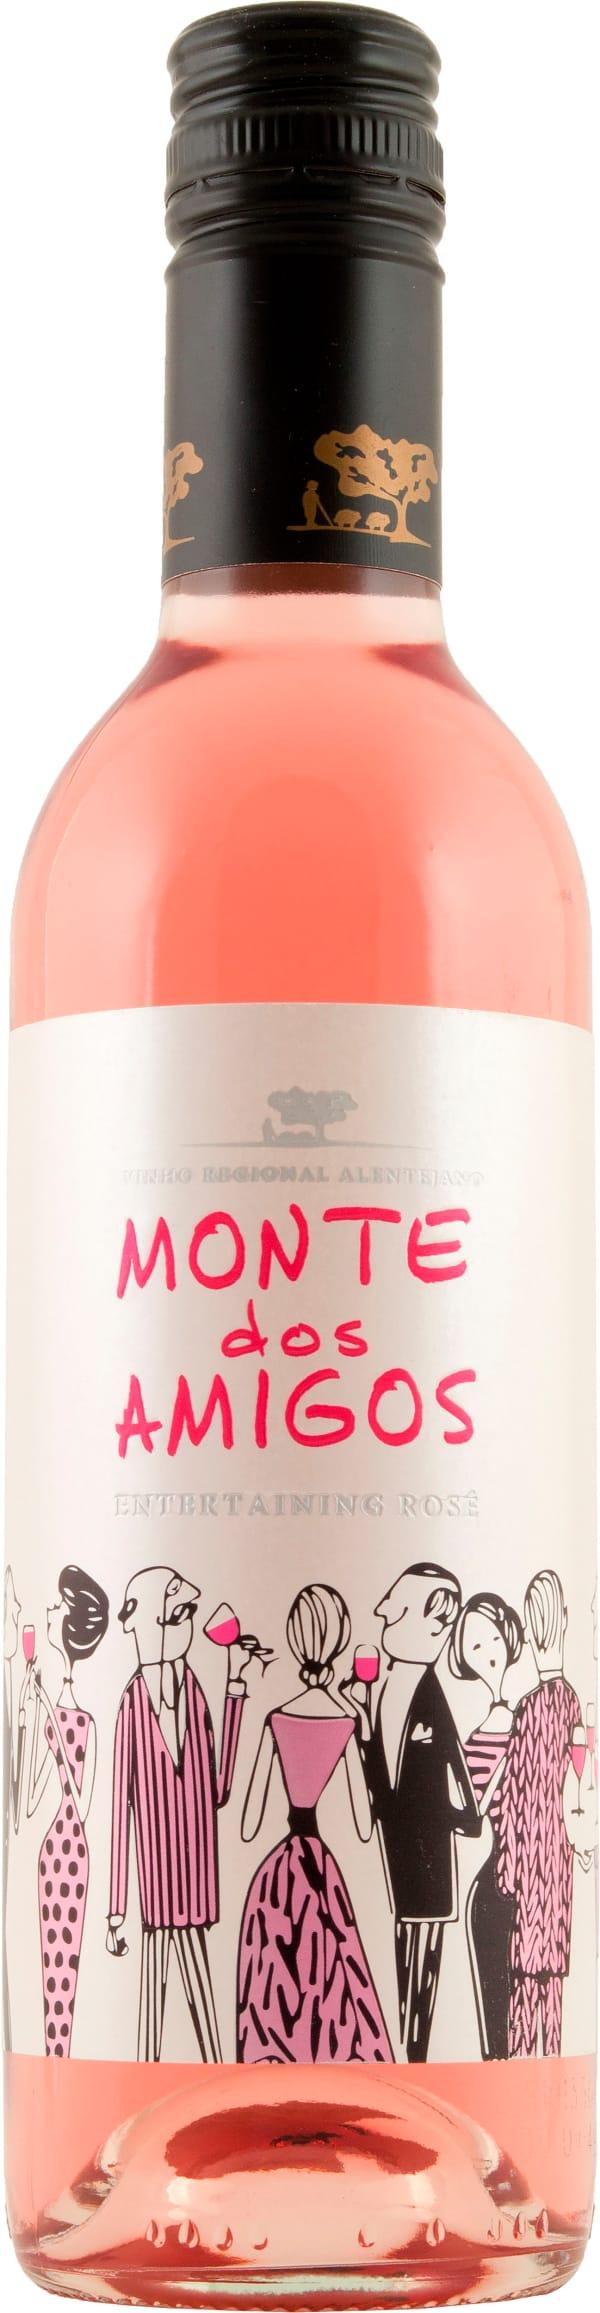 Monte dos Amigos Rosé 2017